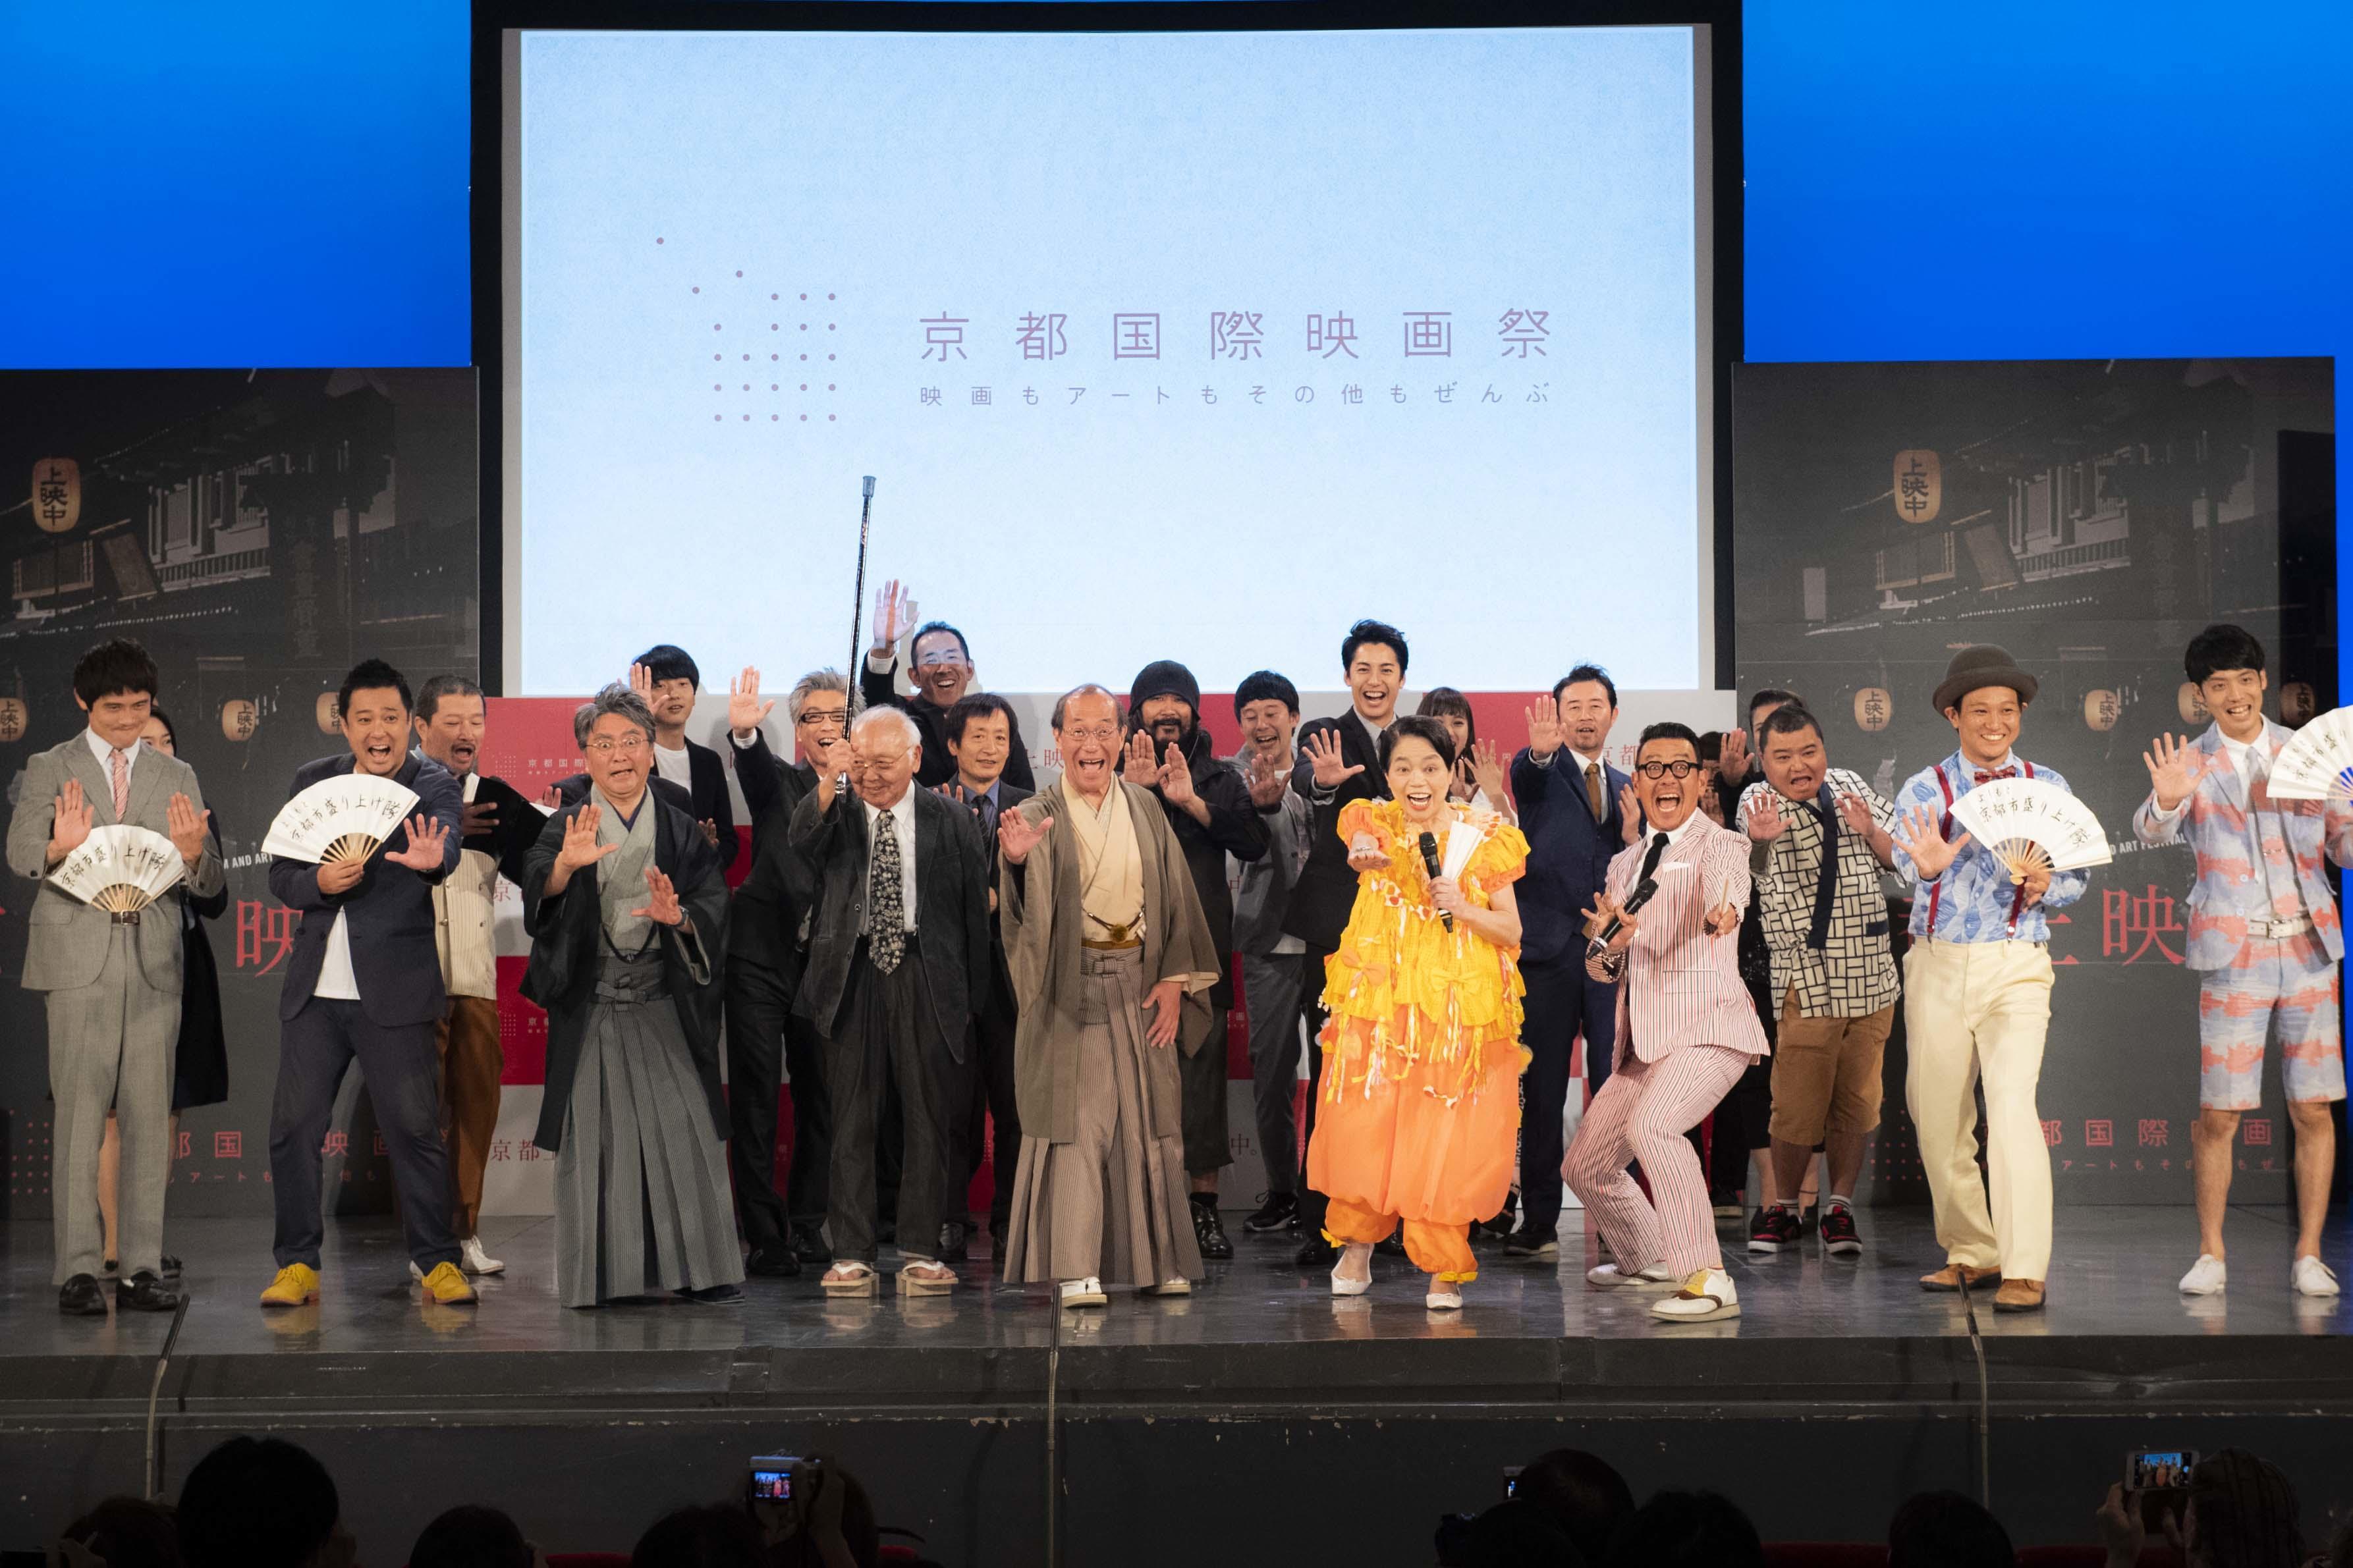 http://news.yoshimoto.co.jp/20180903234328-14e8b42eaf5f1f4c0ed5daacd2980539973edab7.jpg